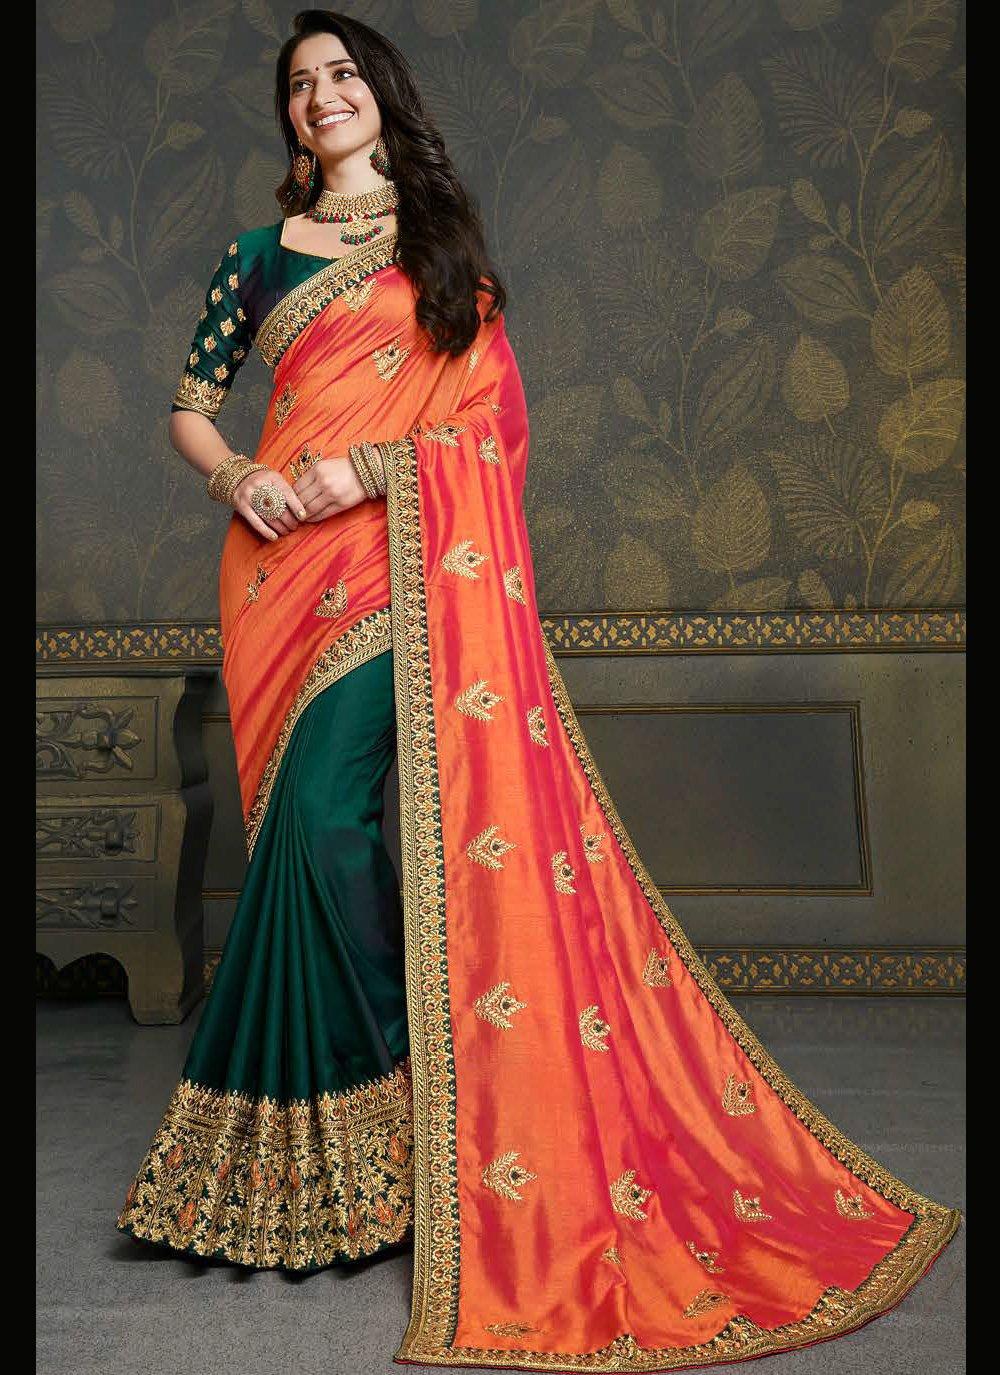 Tamannaah Bhatia Orange and Teal Sangeet Designer Half N Half Saree